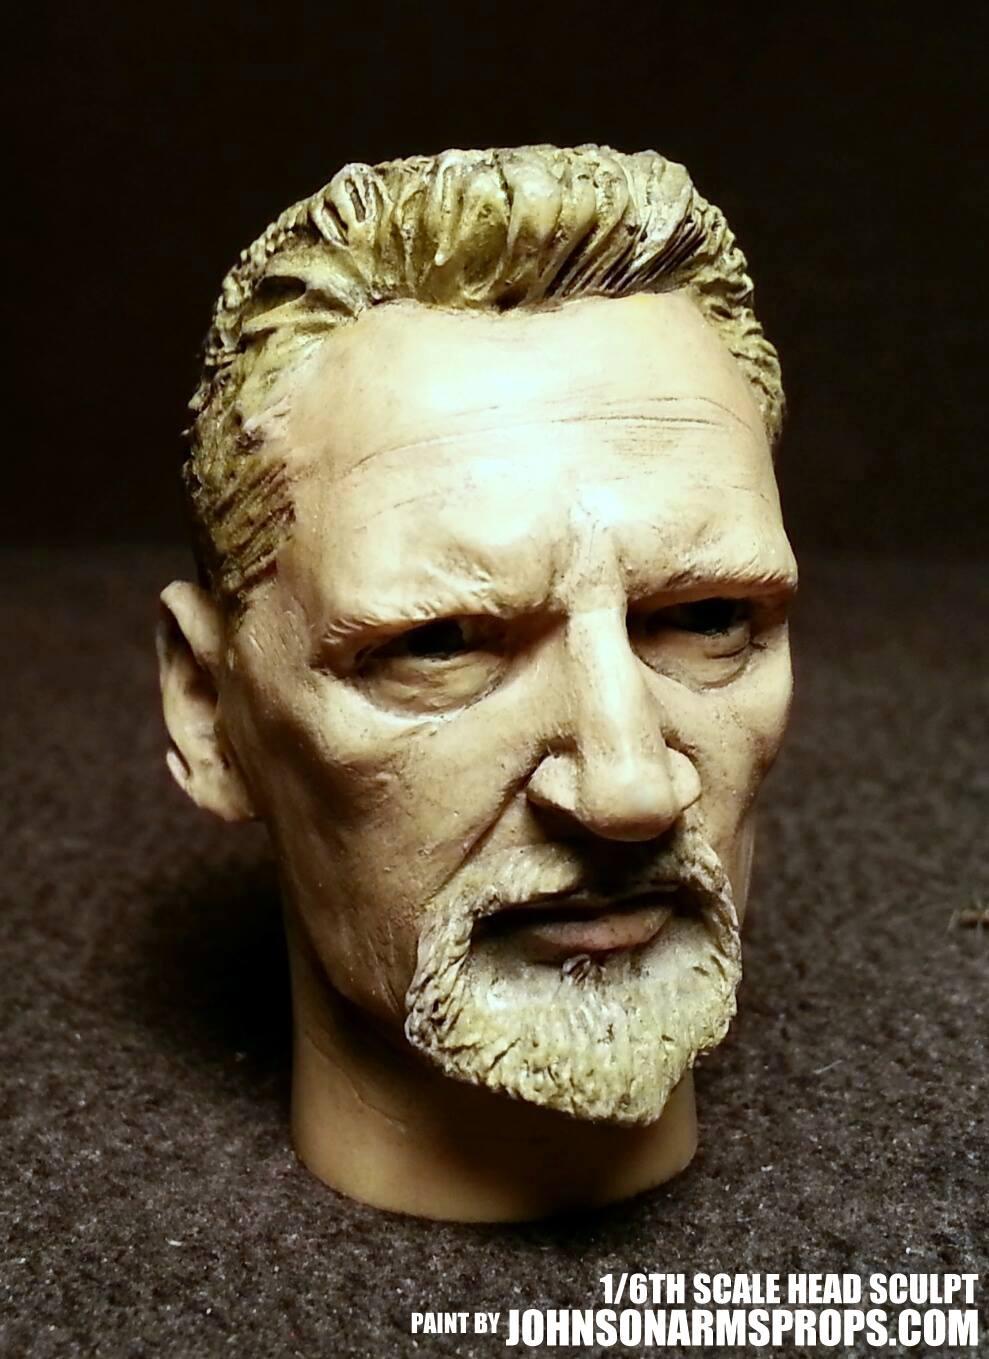 Liam Neeson 1/6th Scale Sculpt Paintjob by JohnsonArms